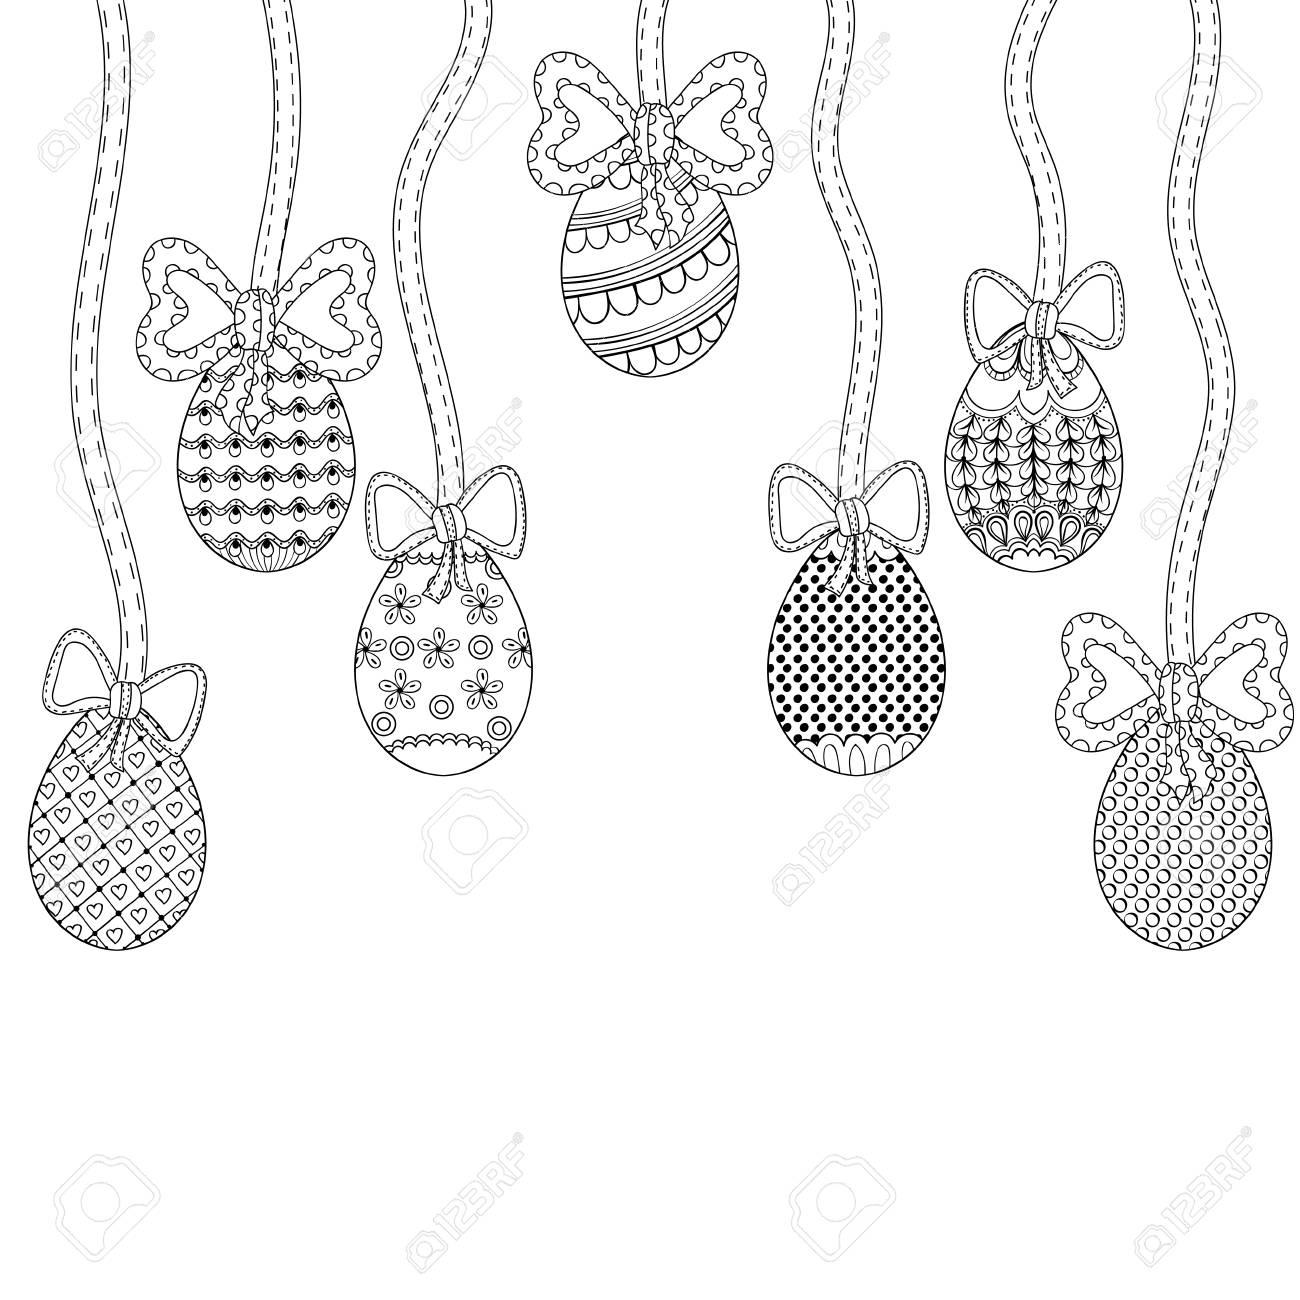 Zentangle Huevos De Pascua Con La Decoración Ornamental Elementos